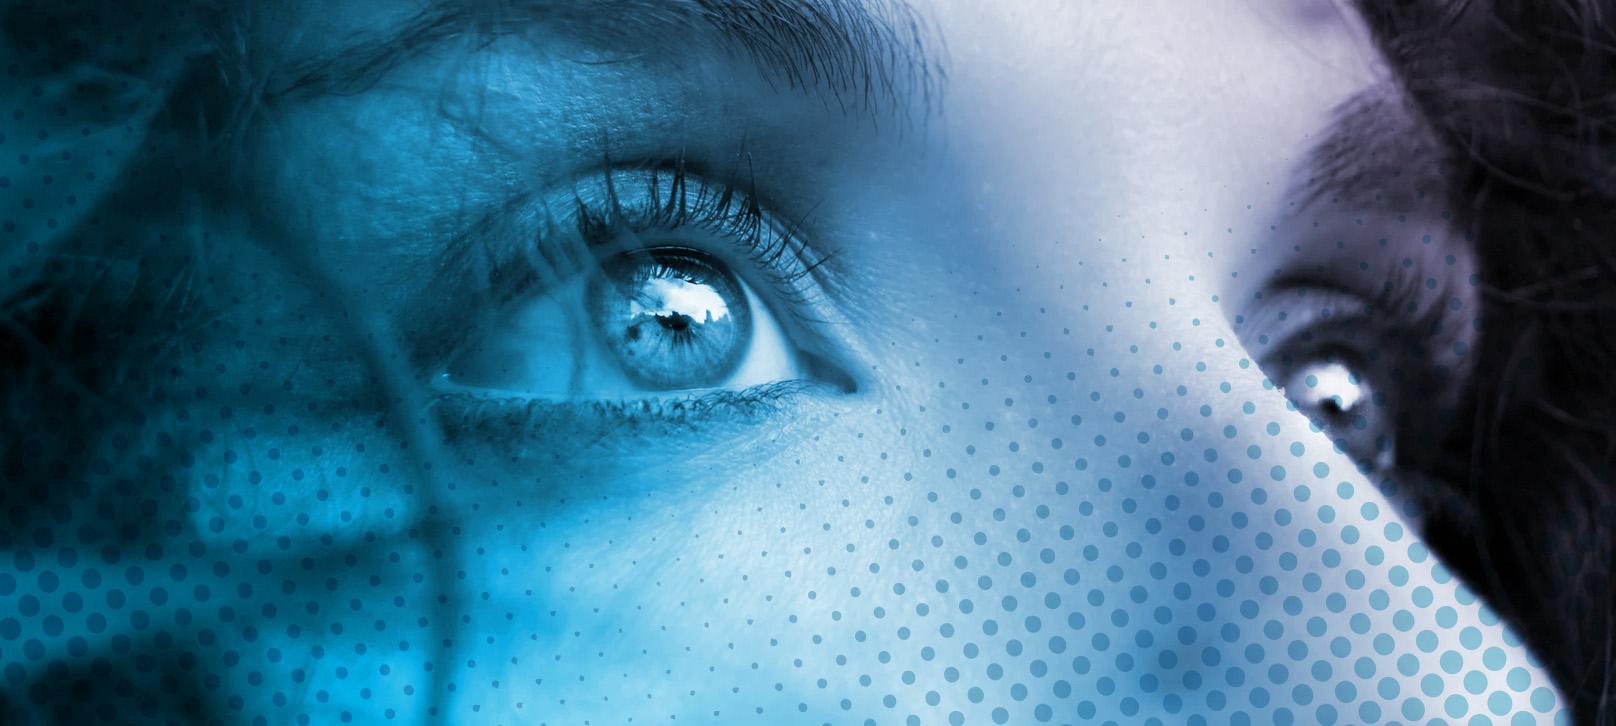 Osteopatia, cervicalgia e disturbi visivi